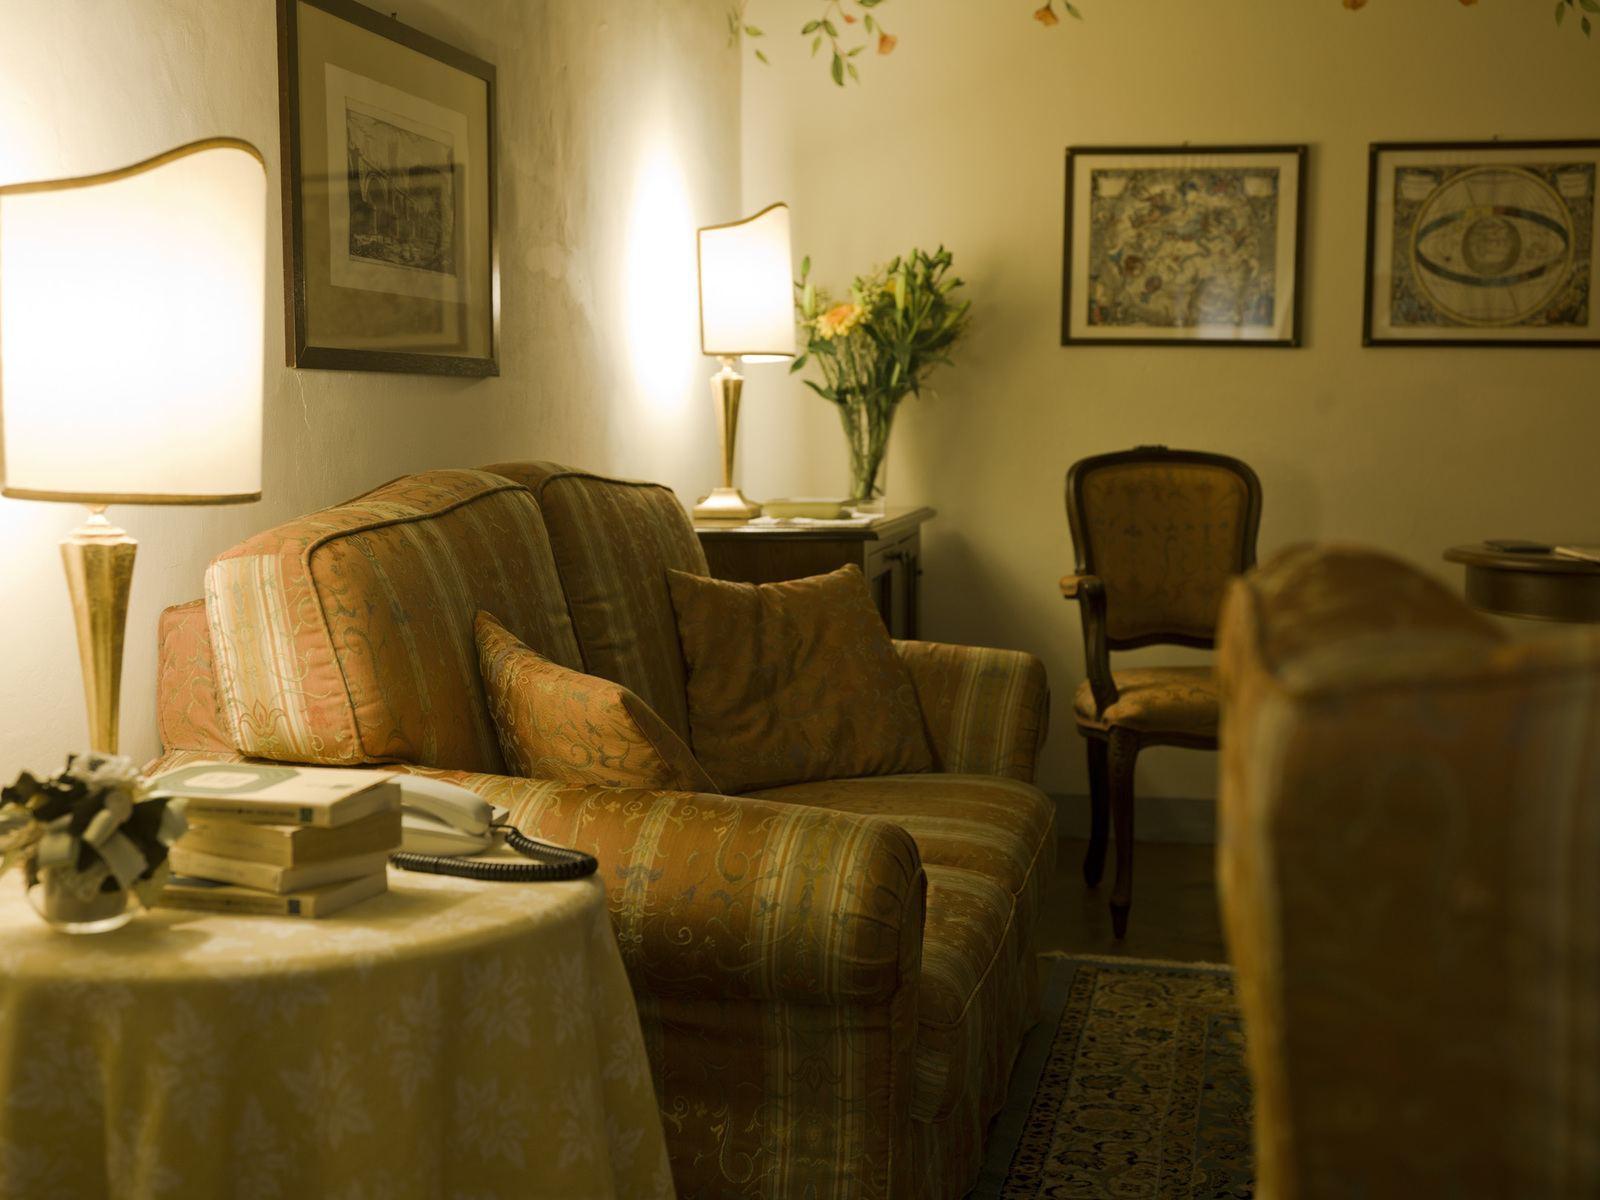 vms-room-family-suite-deluxe-villa-monte